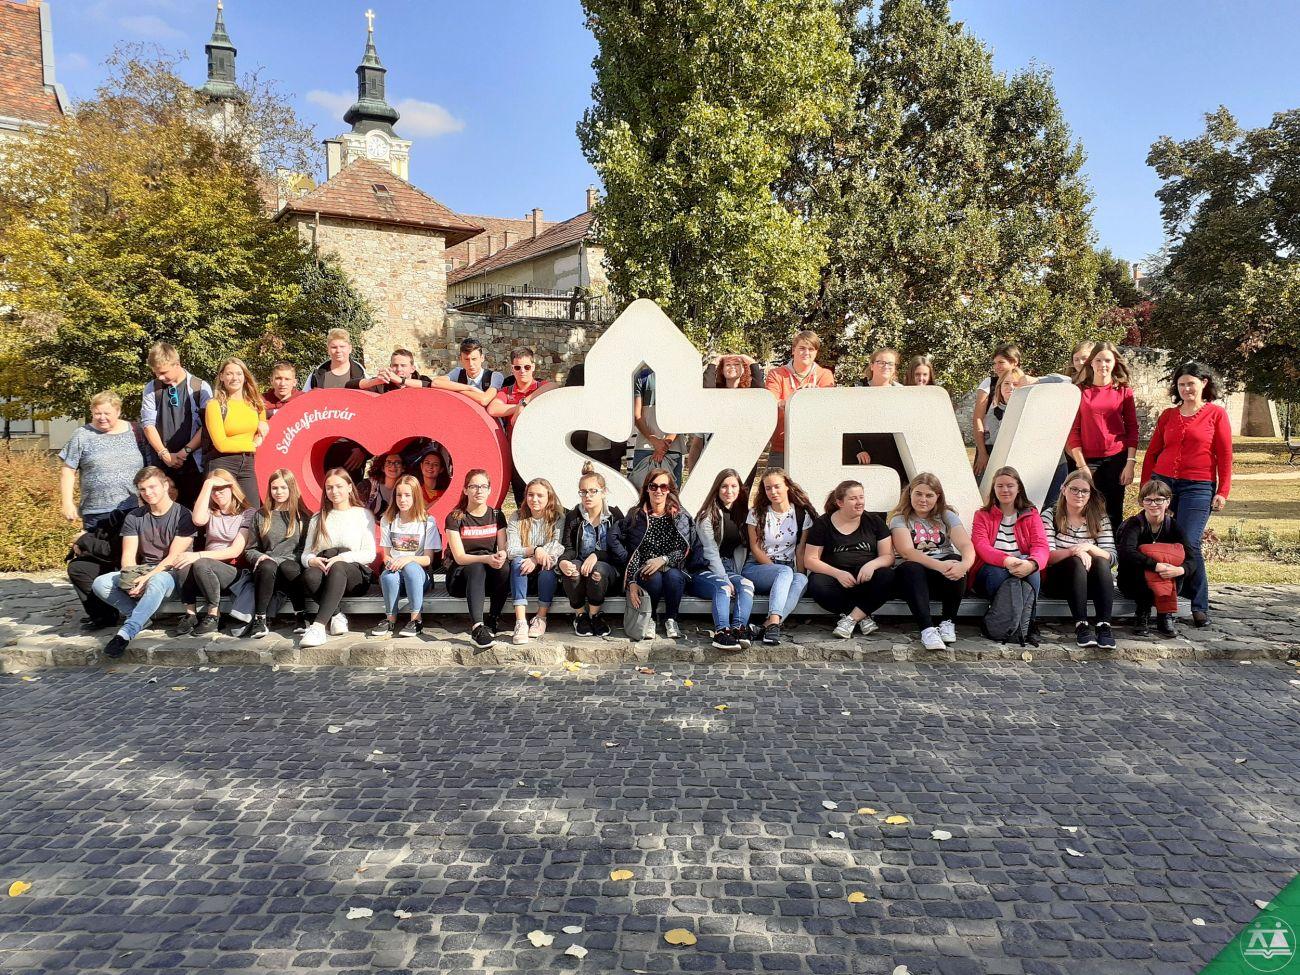 Strokovna-ekskurzija-v-Szekesfehervar-2019-016